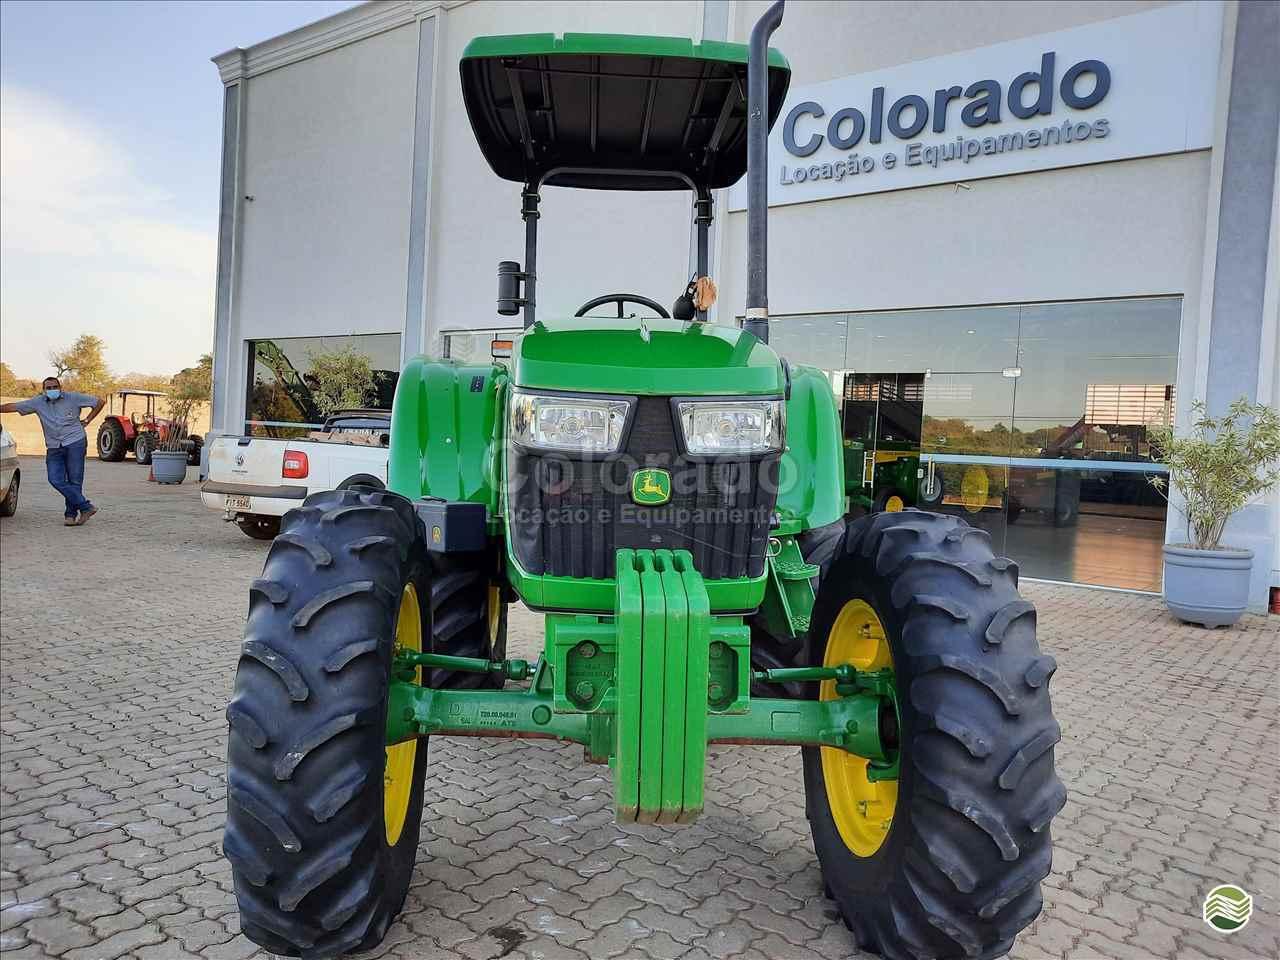 JOHN DEERE 5070 de Colorado Equipamentos - RIBEIRAO PRETO/SP